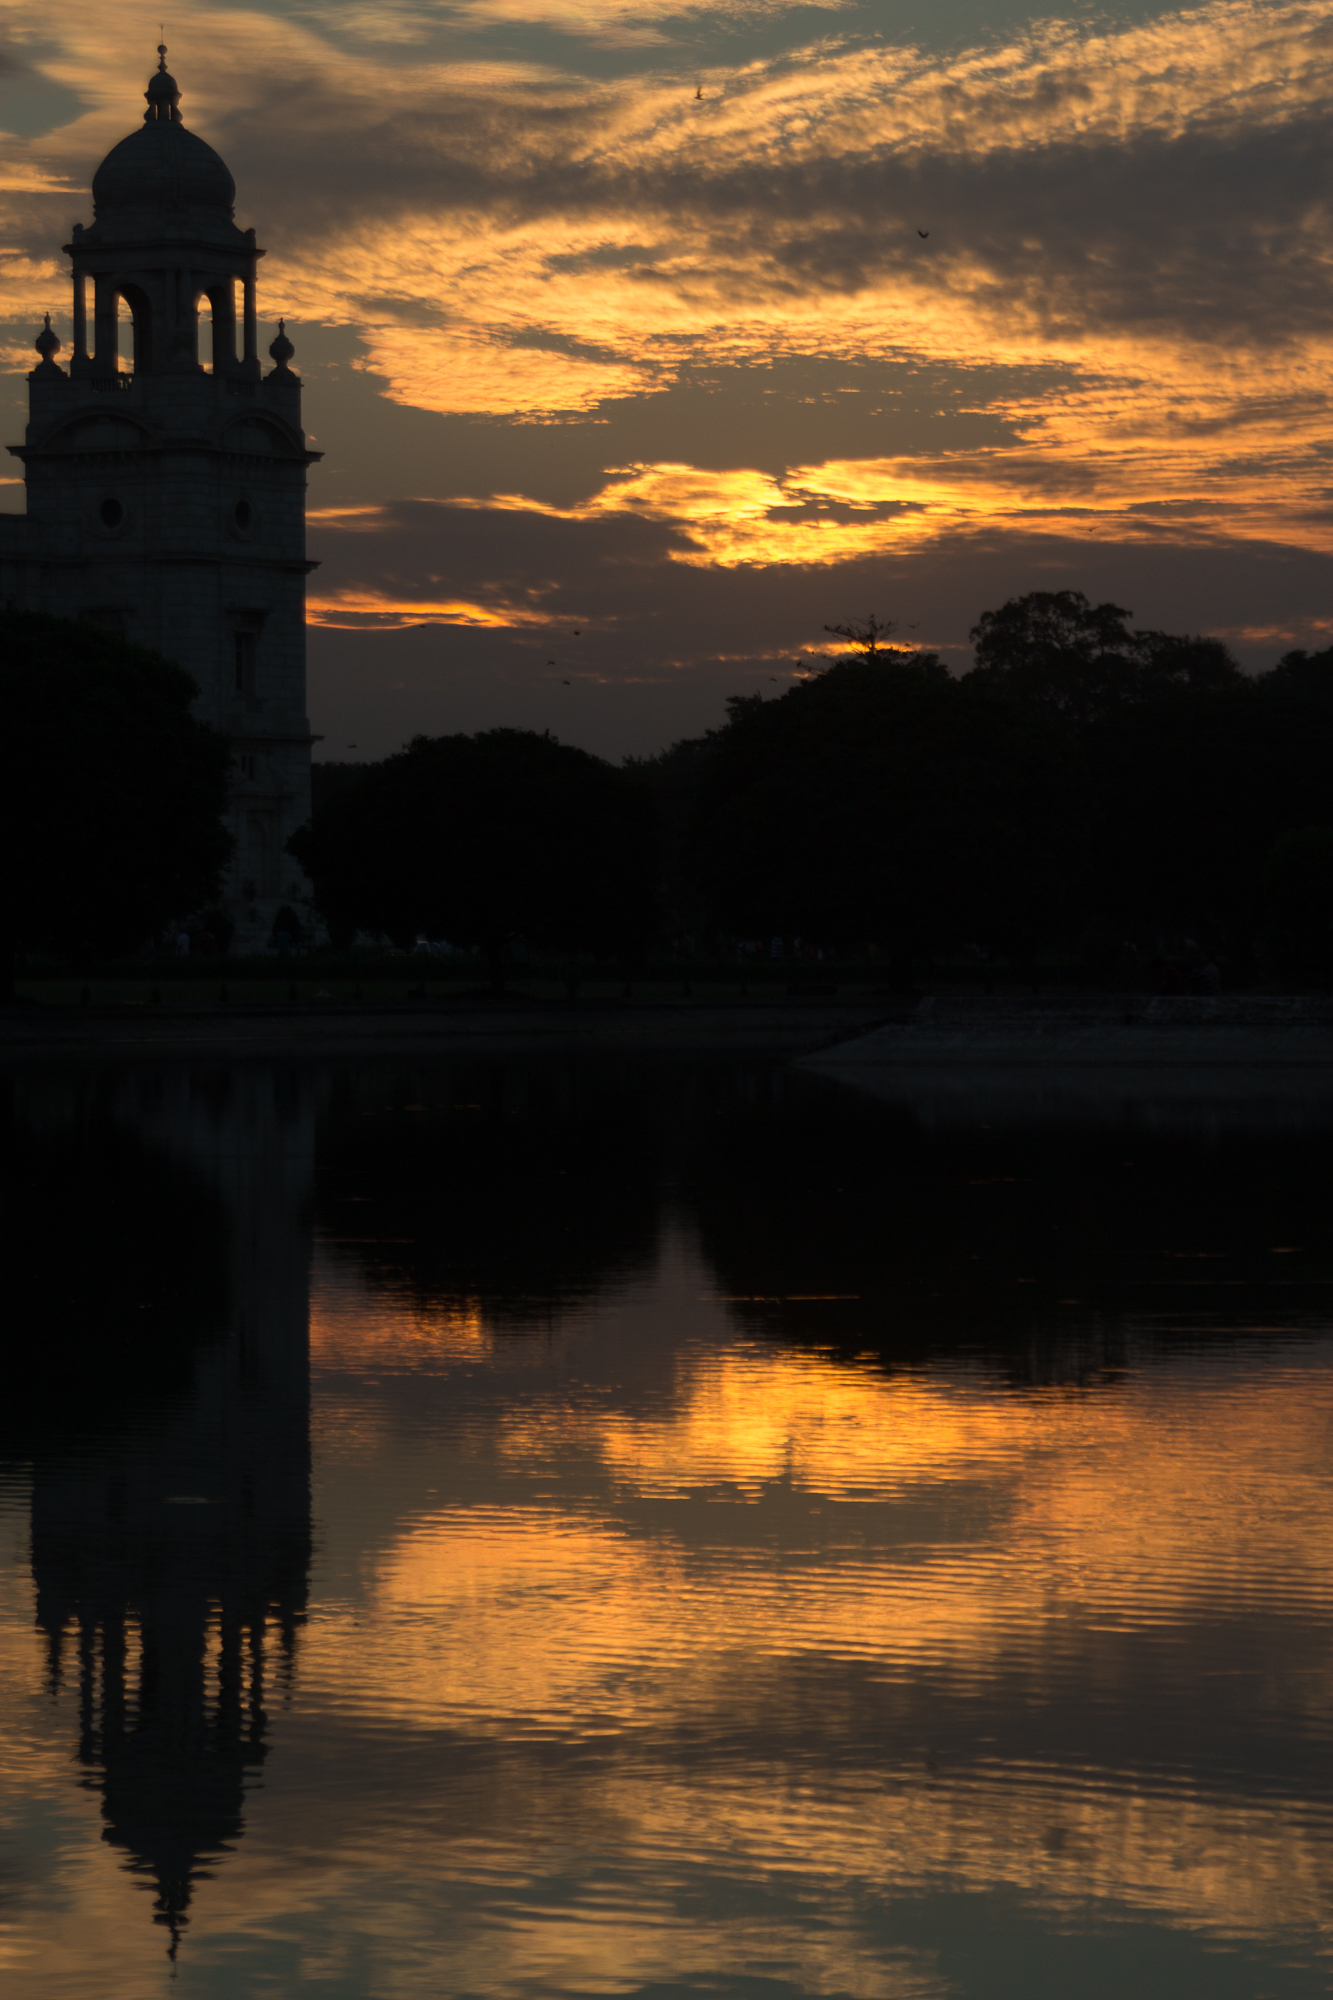 victoria memorial coucher de soleil